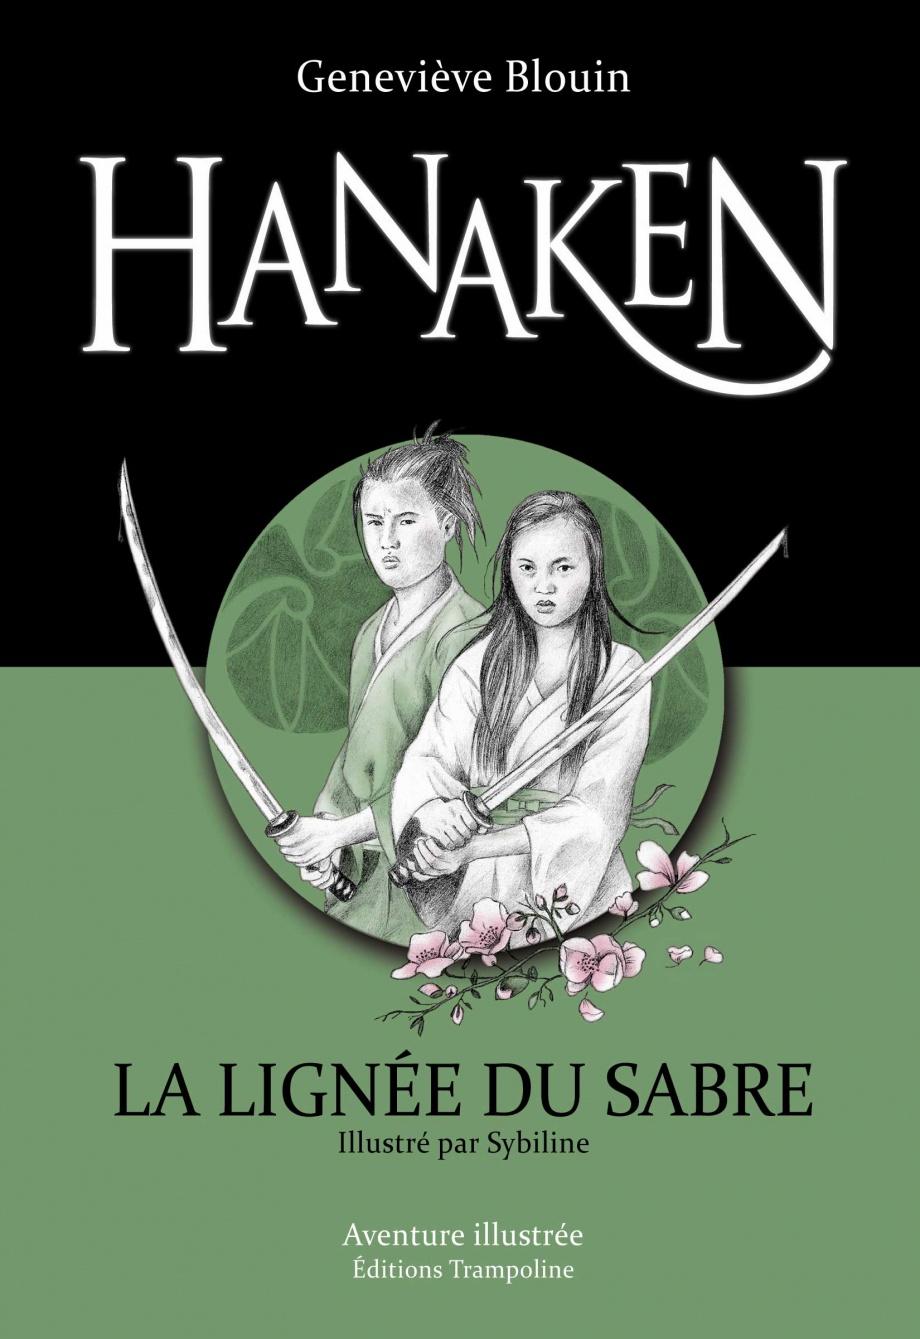 Hanaken, la lignée du sabre